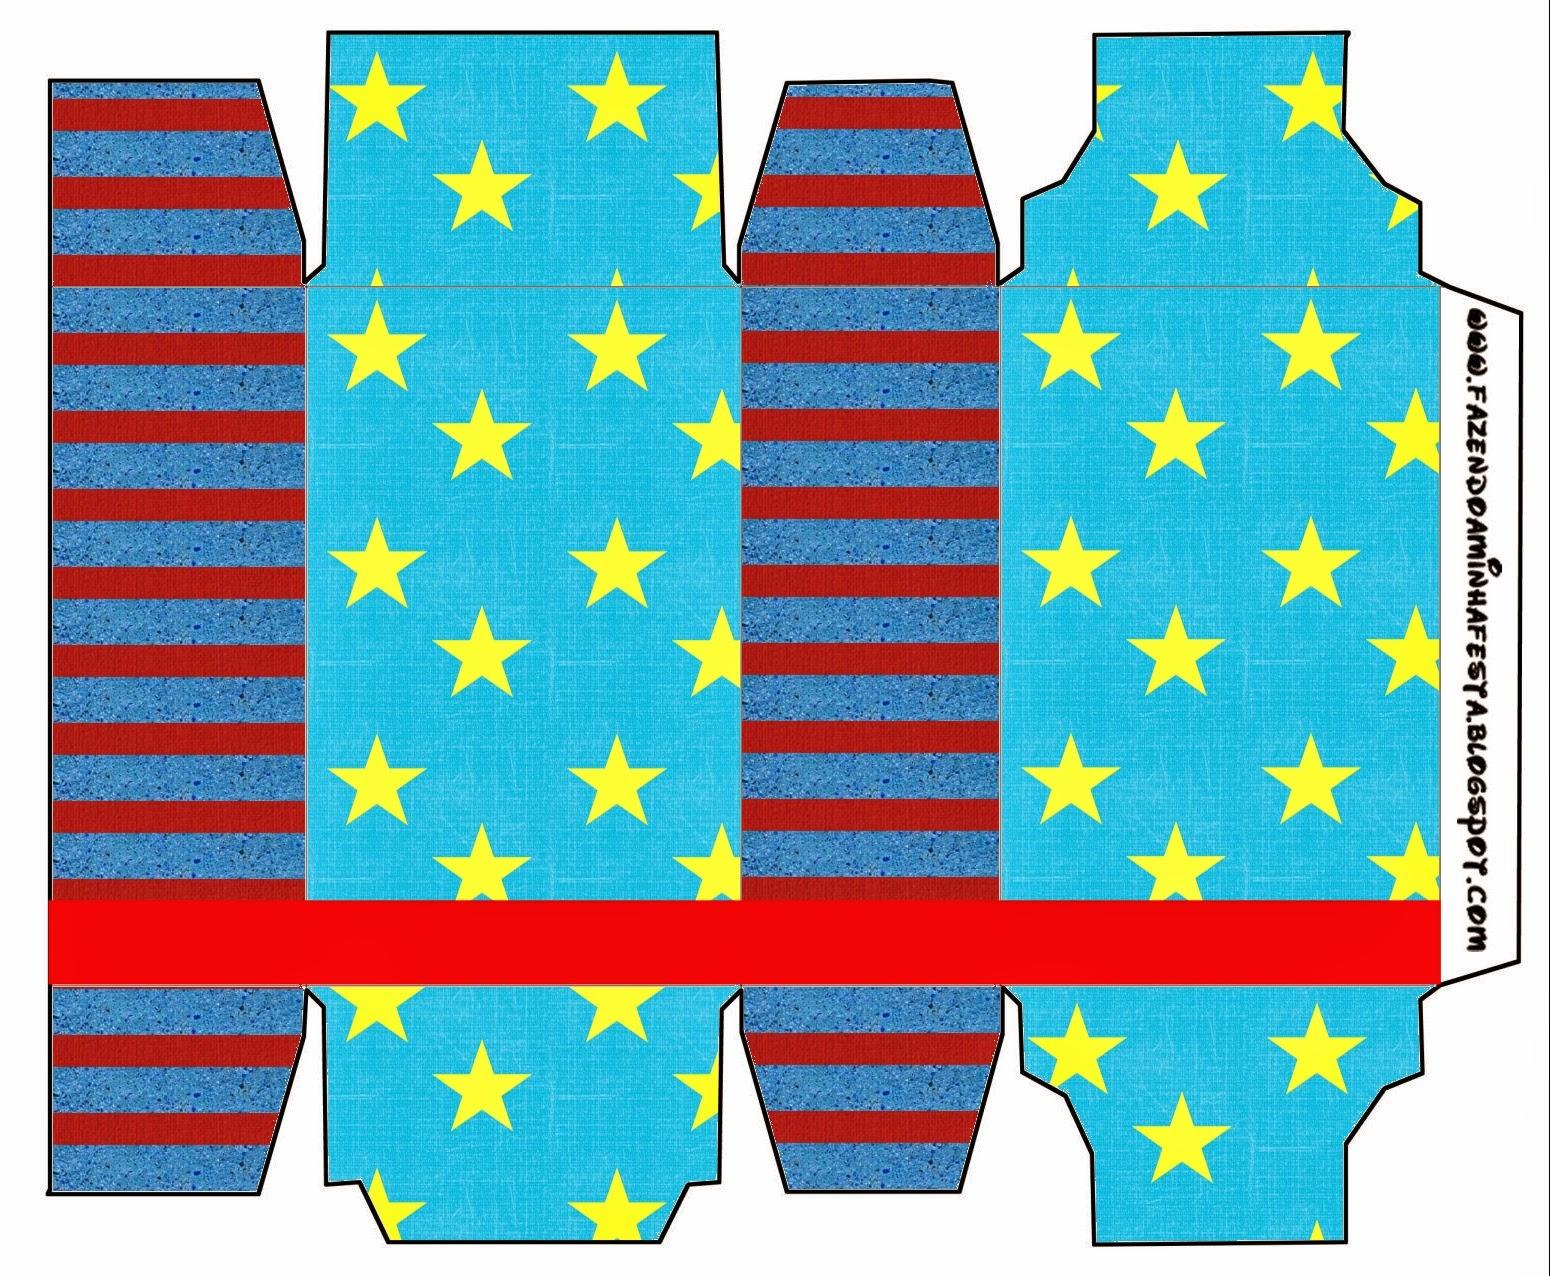 Cajas de Estrellas sobre Fondo Celeste para imprimir gratis.